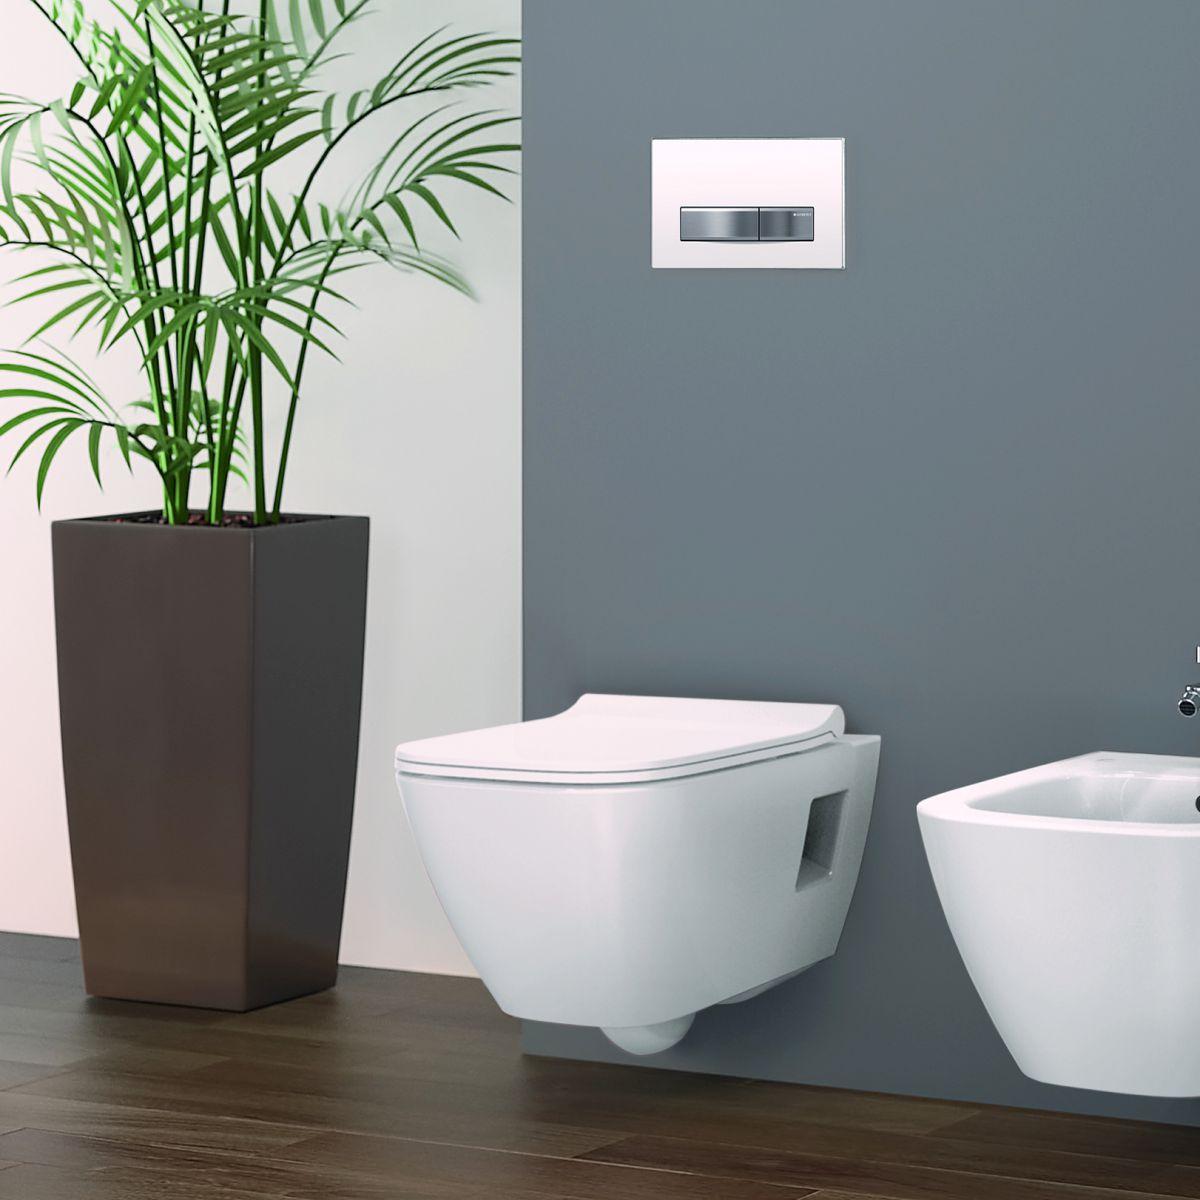 Geberit Smyle Square Wall Hung Toilet Rimfree Bathrooms